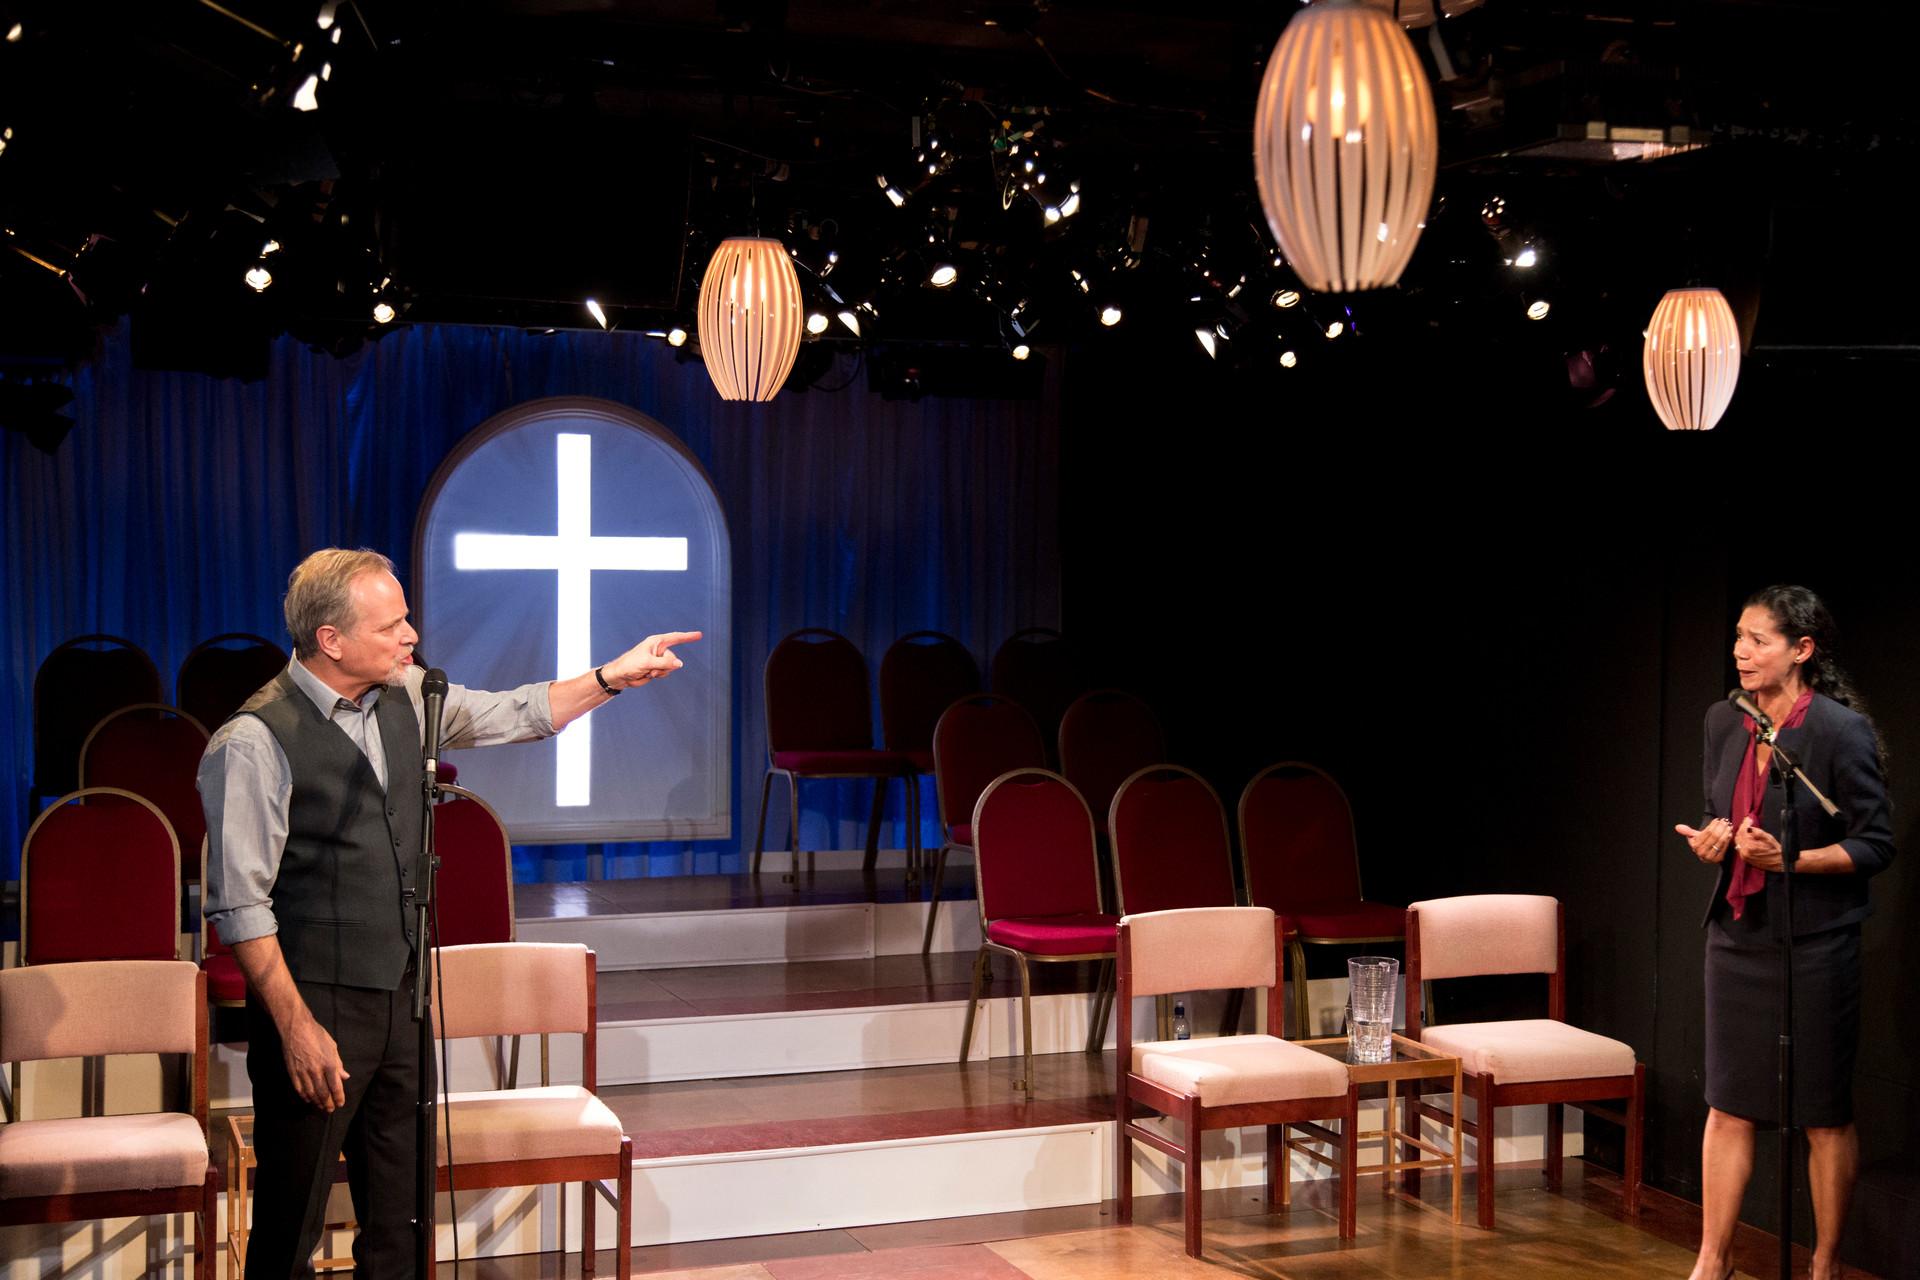 42The Christians_Gate Theatre_ Simon Dutso